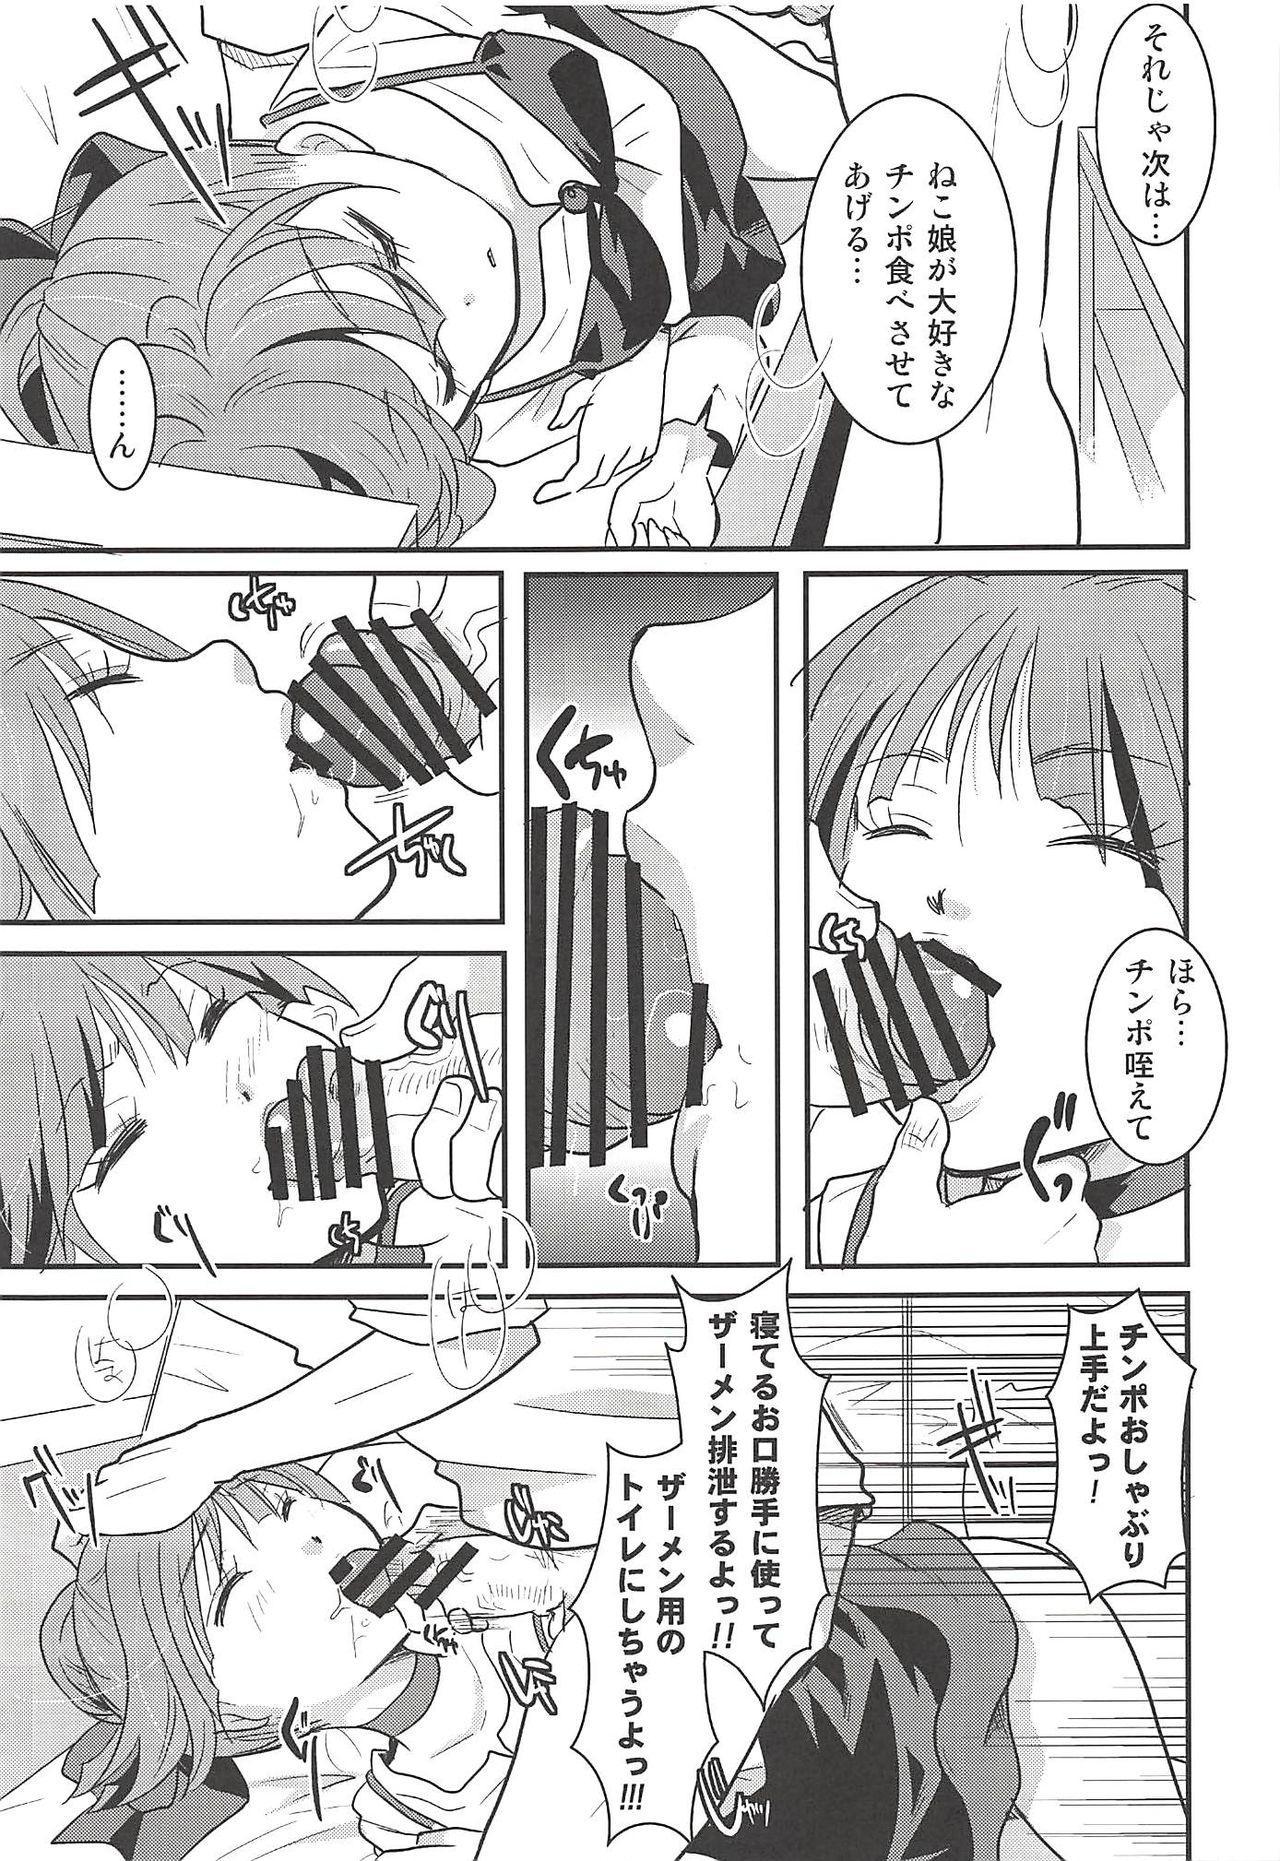 Neko Musume Suikan 29